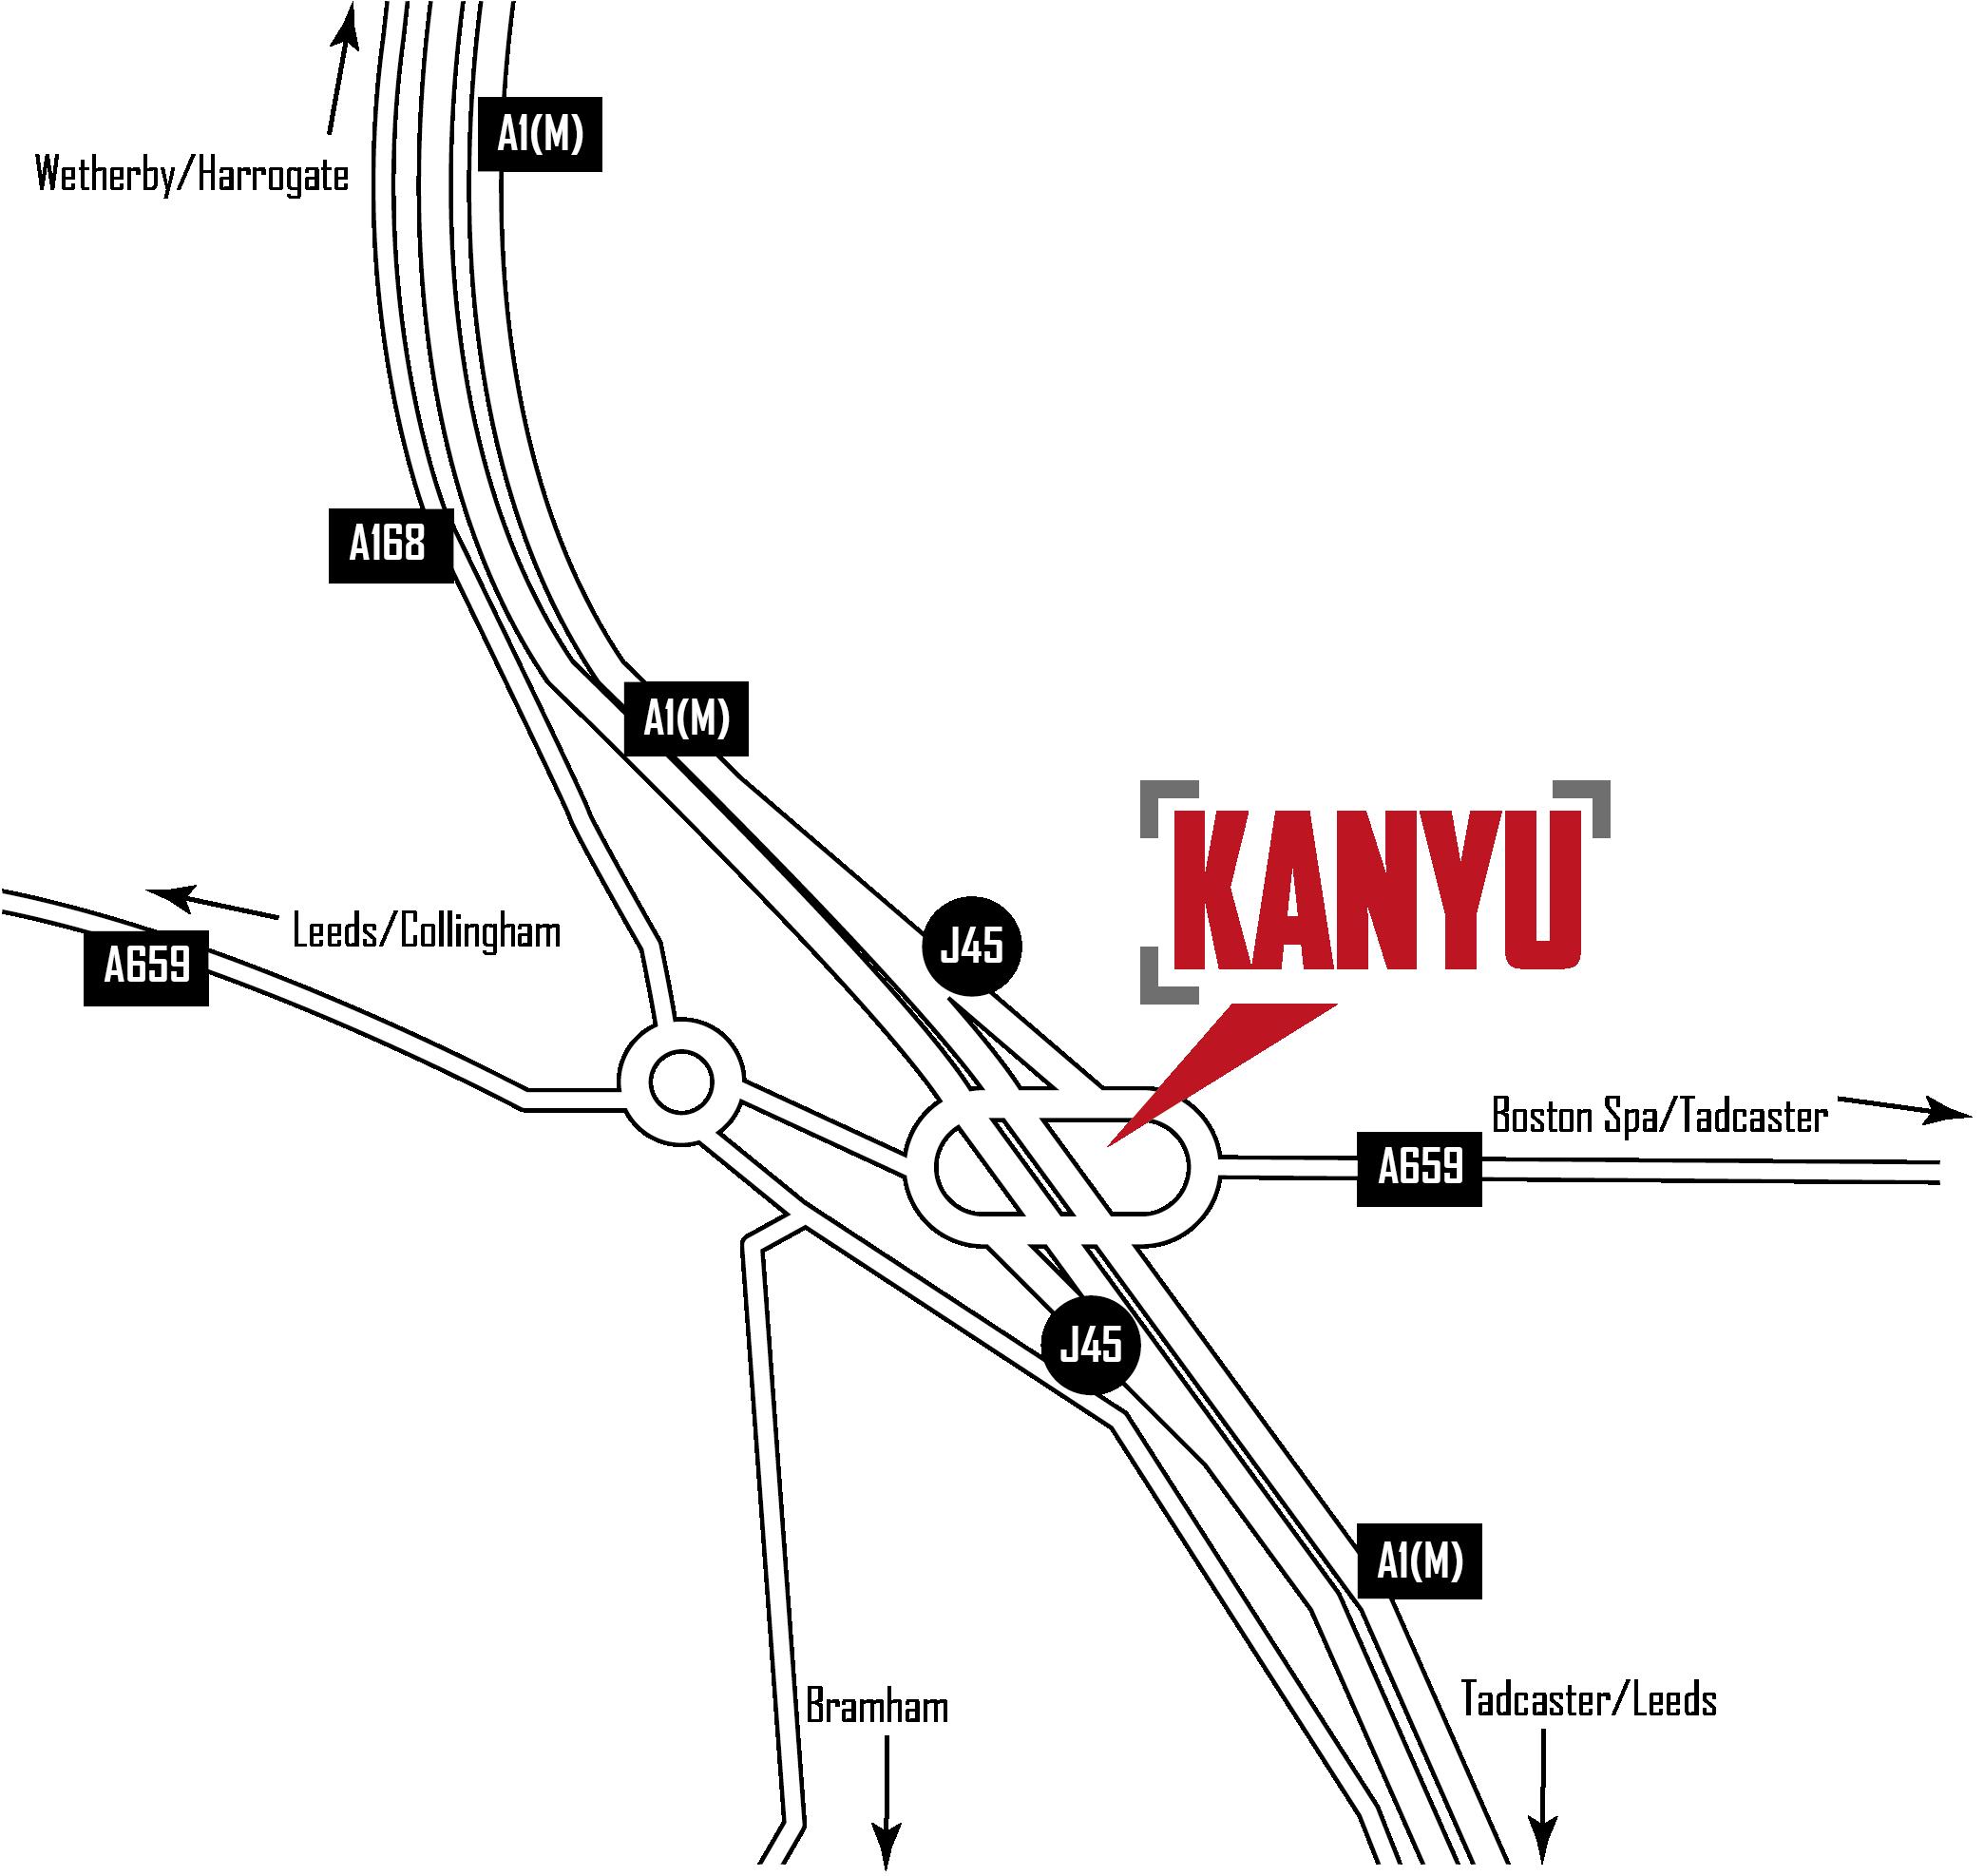 Kanyu Location